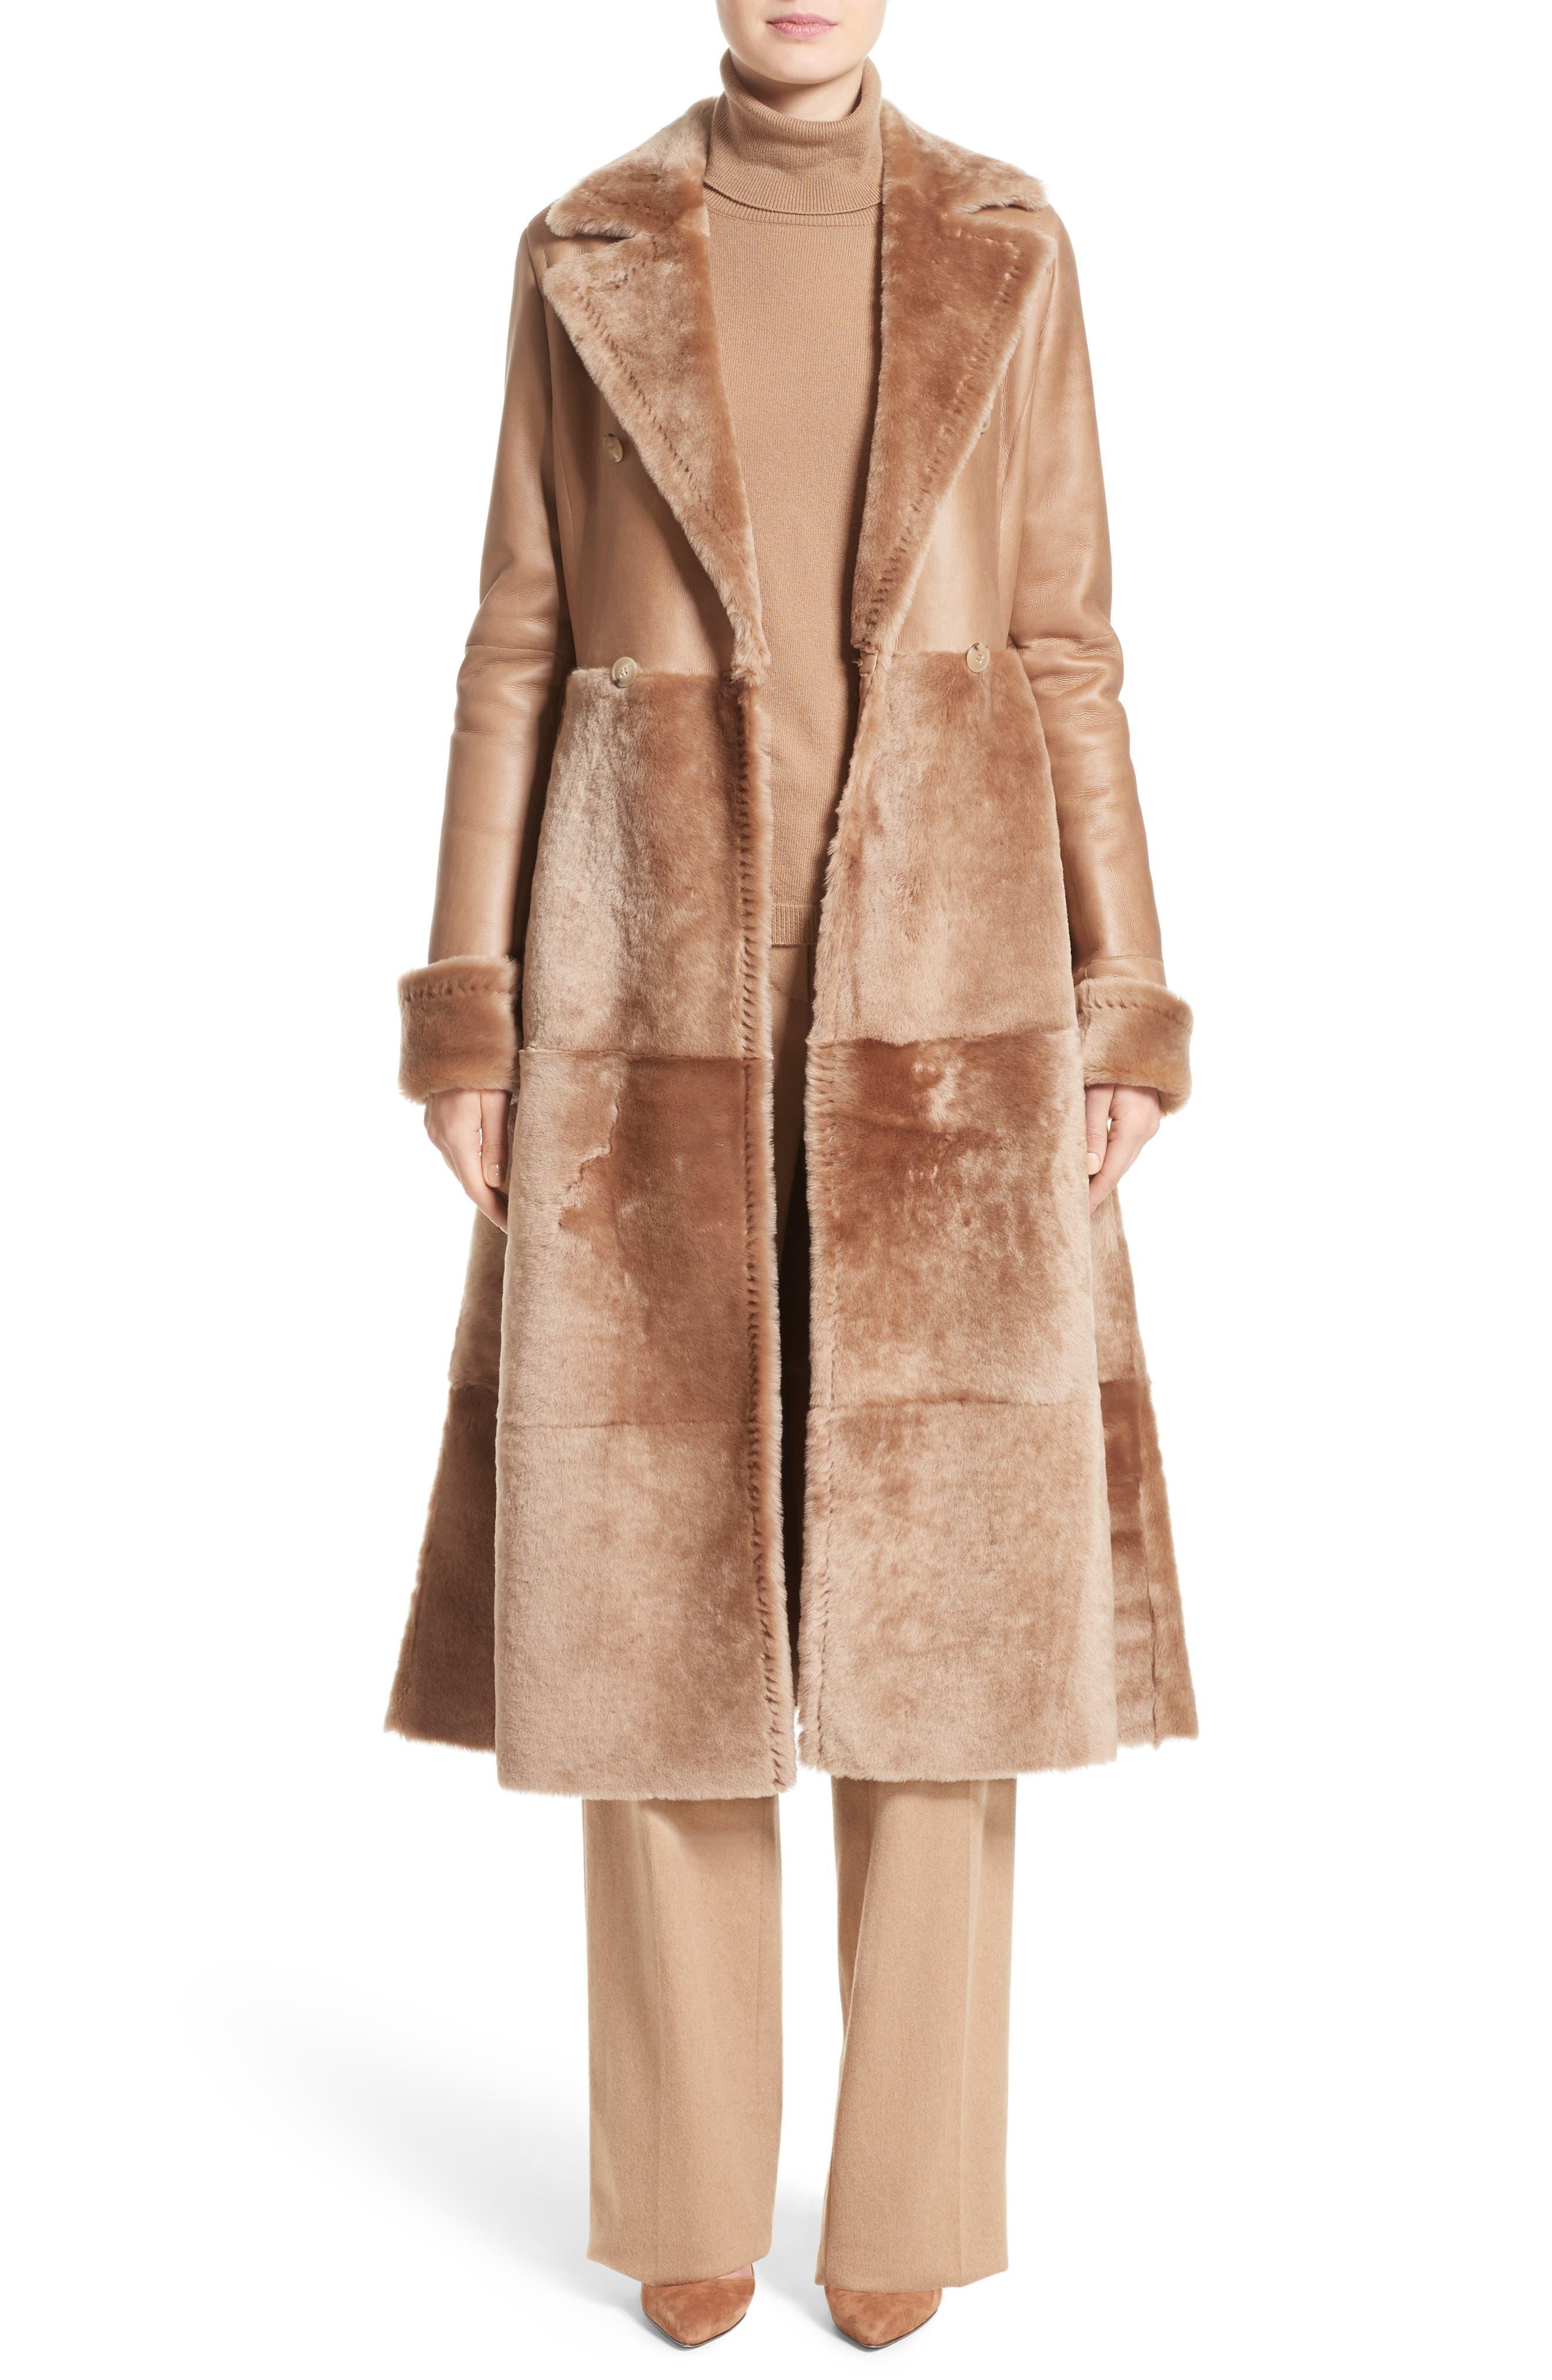 Rimini Genuine Shearling Coat,                             Alternate thumbnail 7, color,                             CAMEL